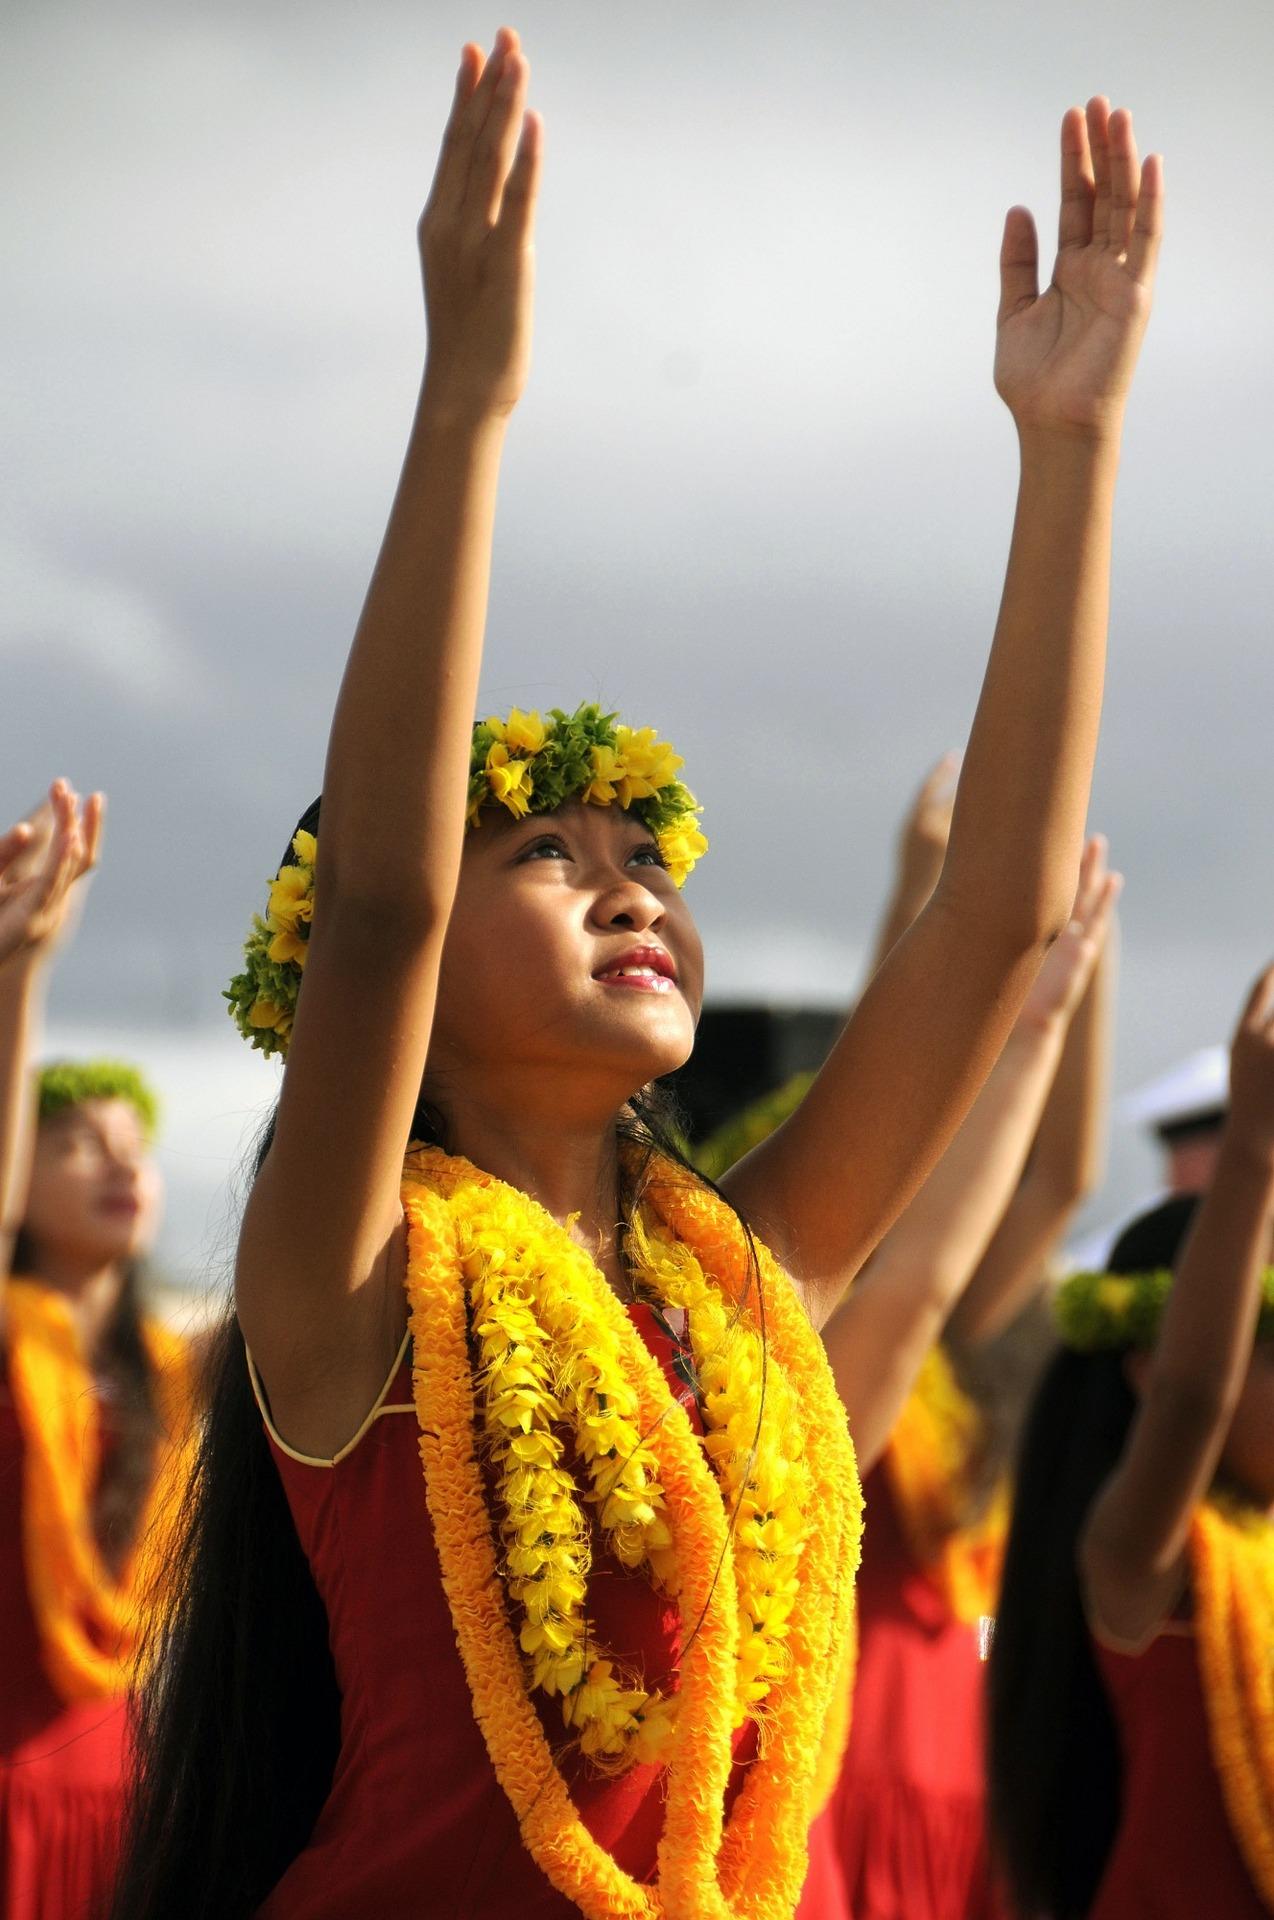 Authentic Hawaiian Luau Dollarphotoclub Public Domain